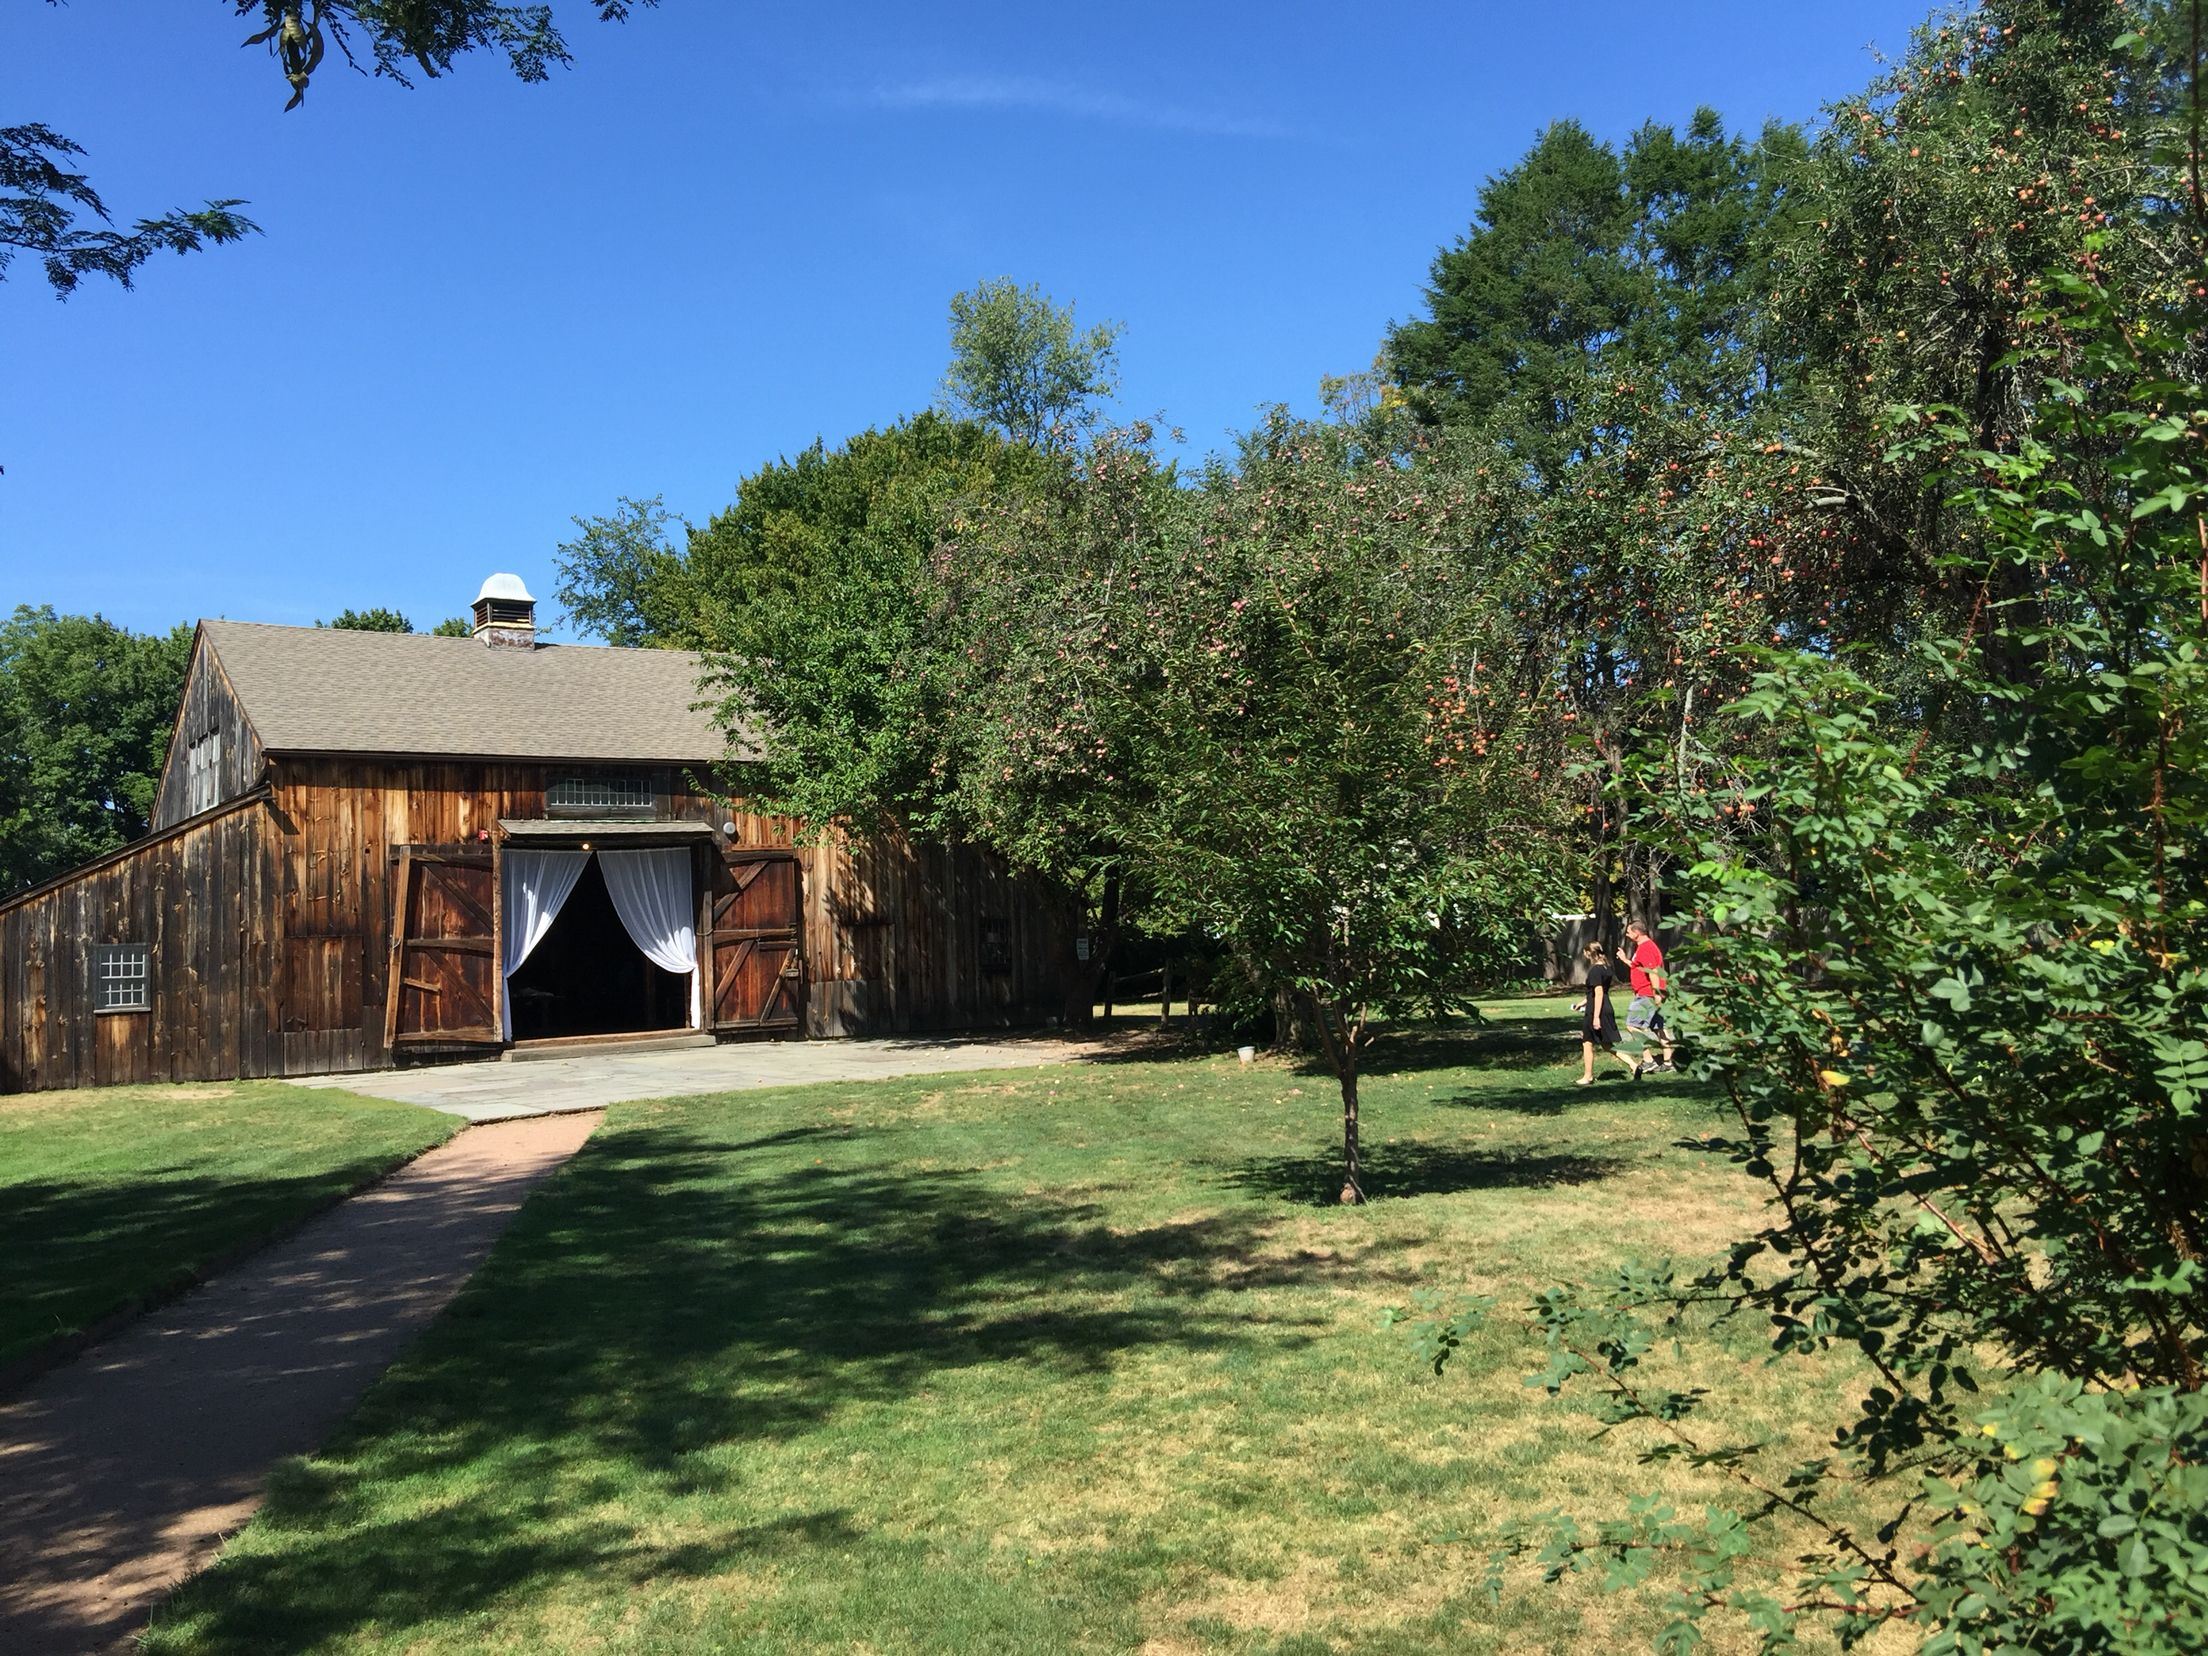 Webb Barn in Wethersfield, Connecticut is an ideal rustic ...